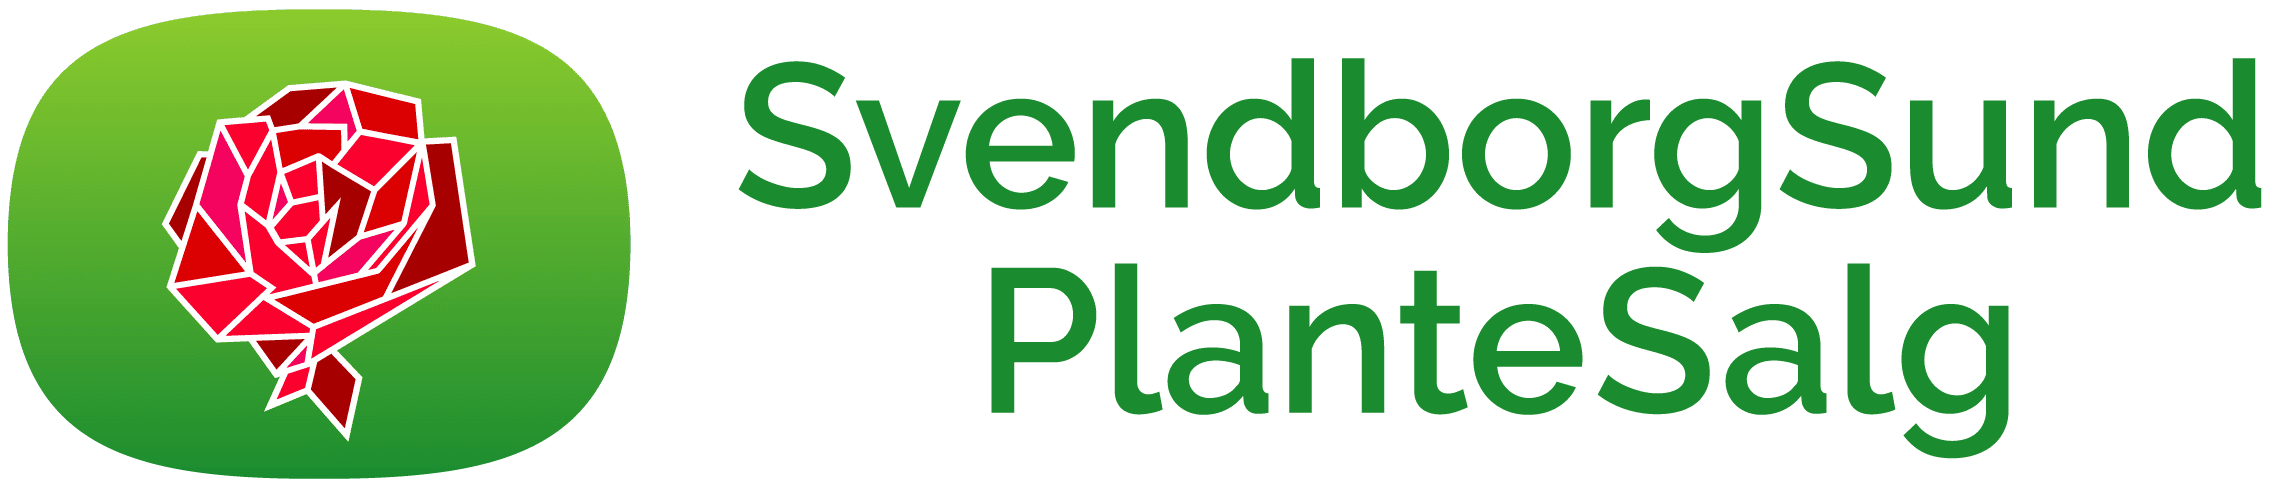 Svendborgsund Plantesalg